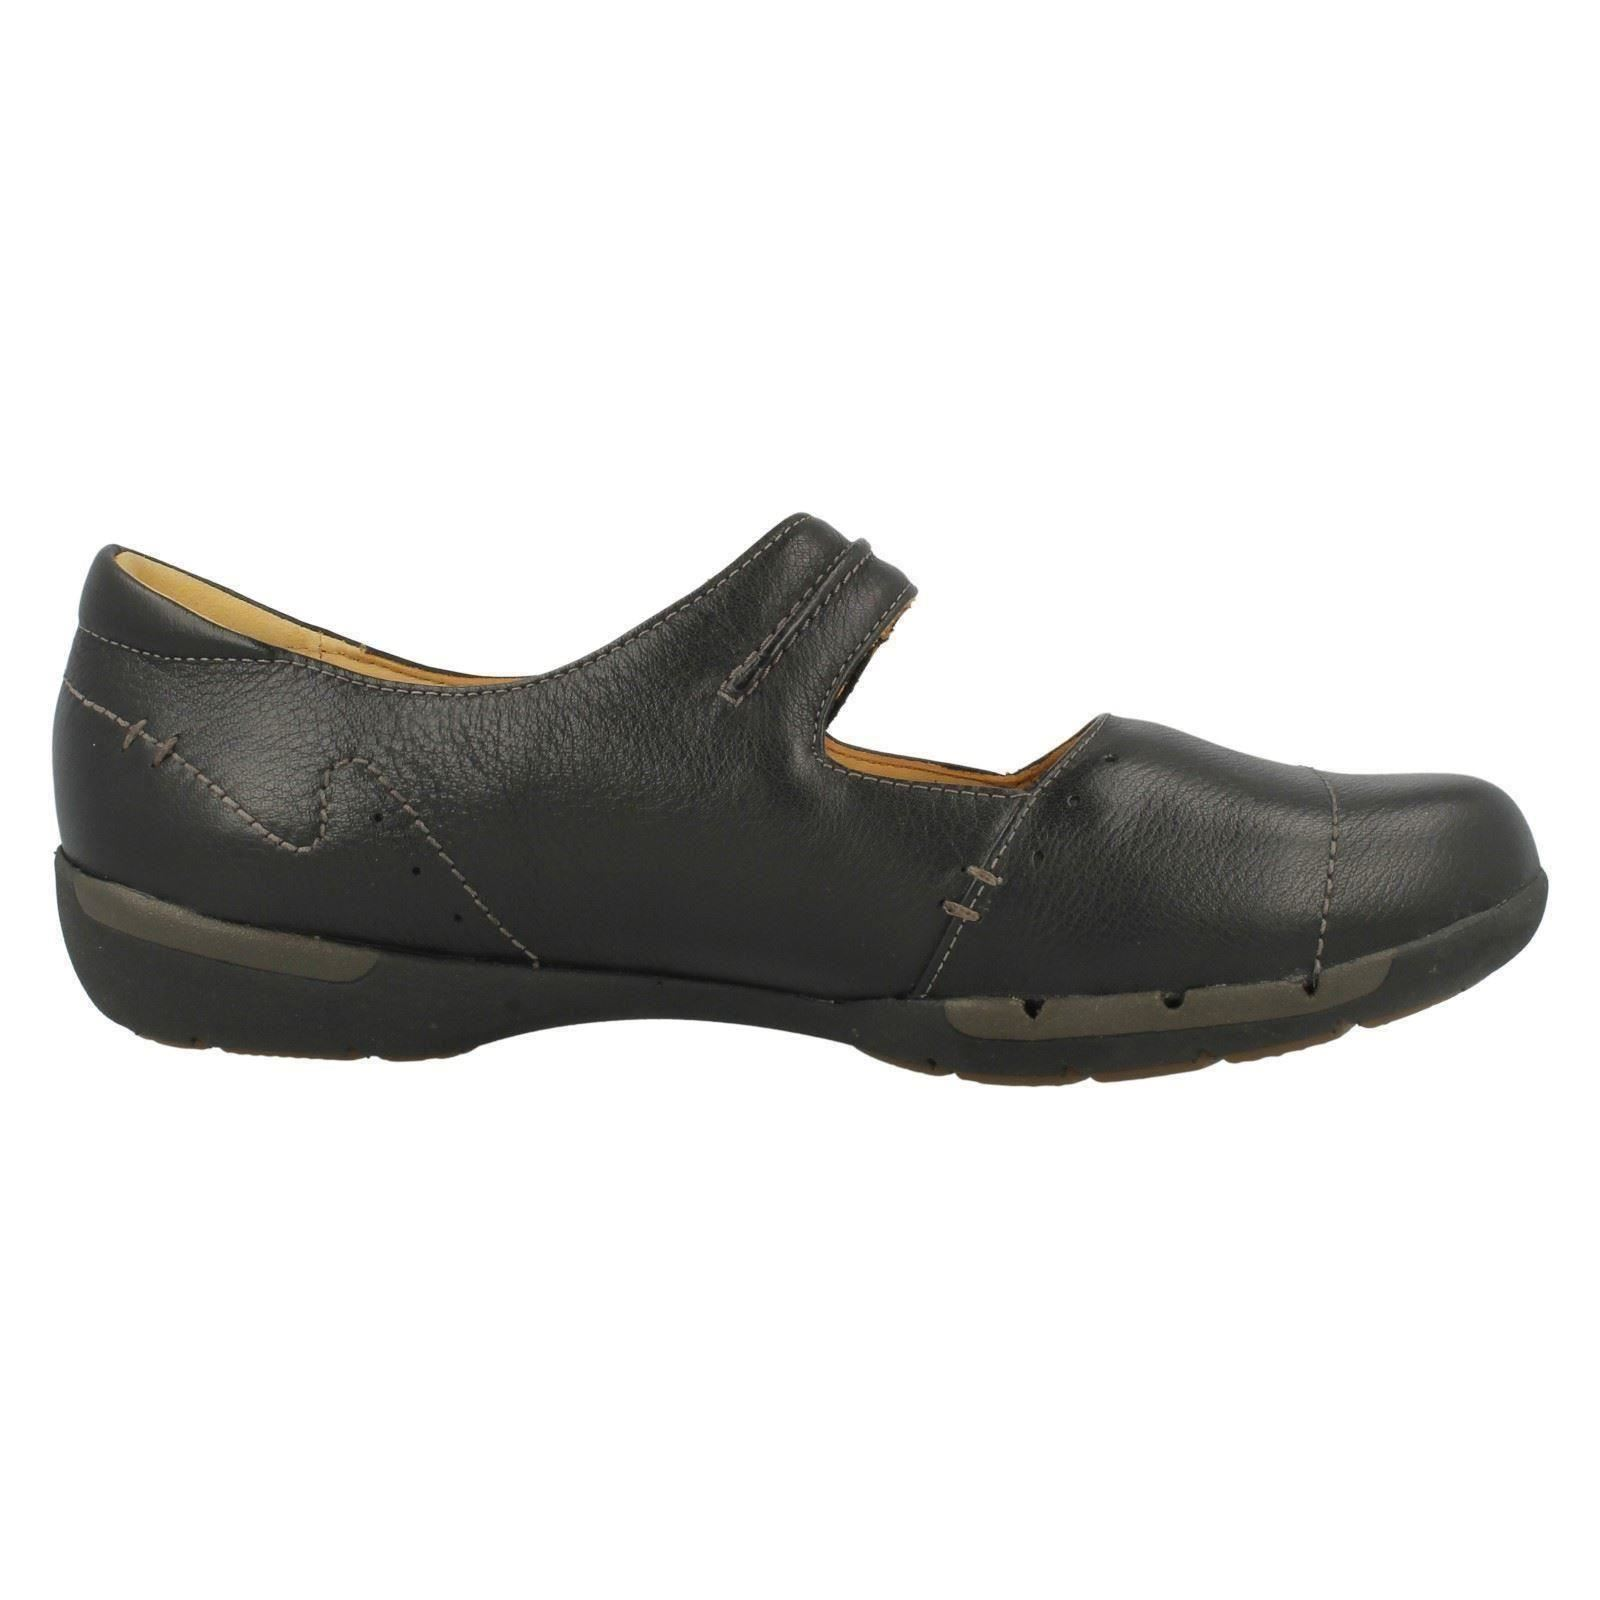 Ladies Clarks Unstructured Flat Shoes Un Helma | EBay